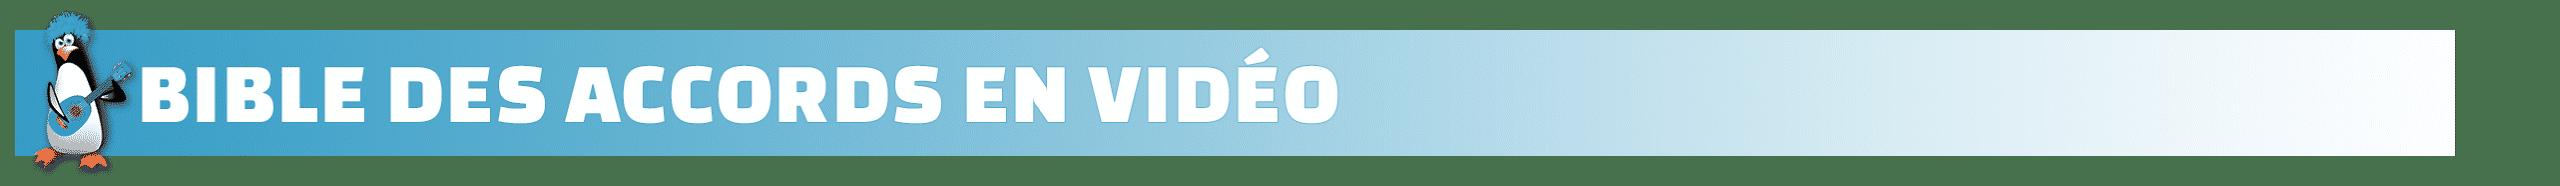 bible des accords en video